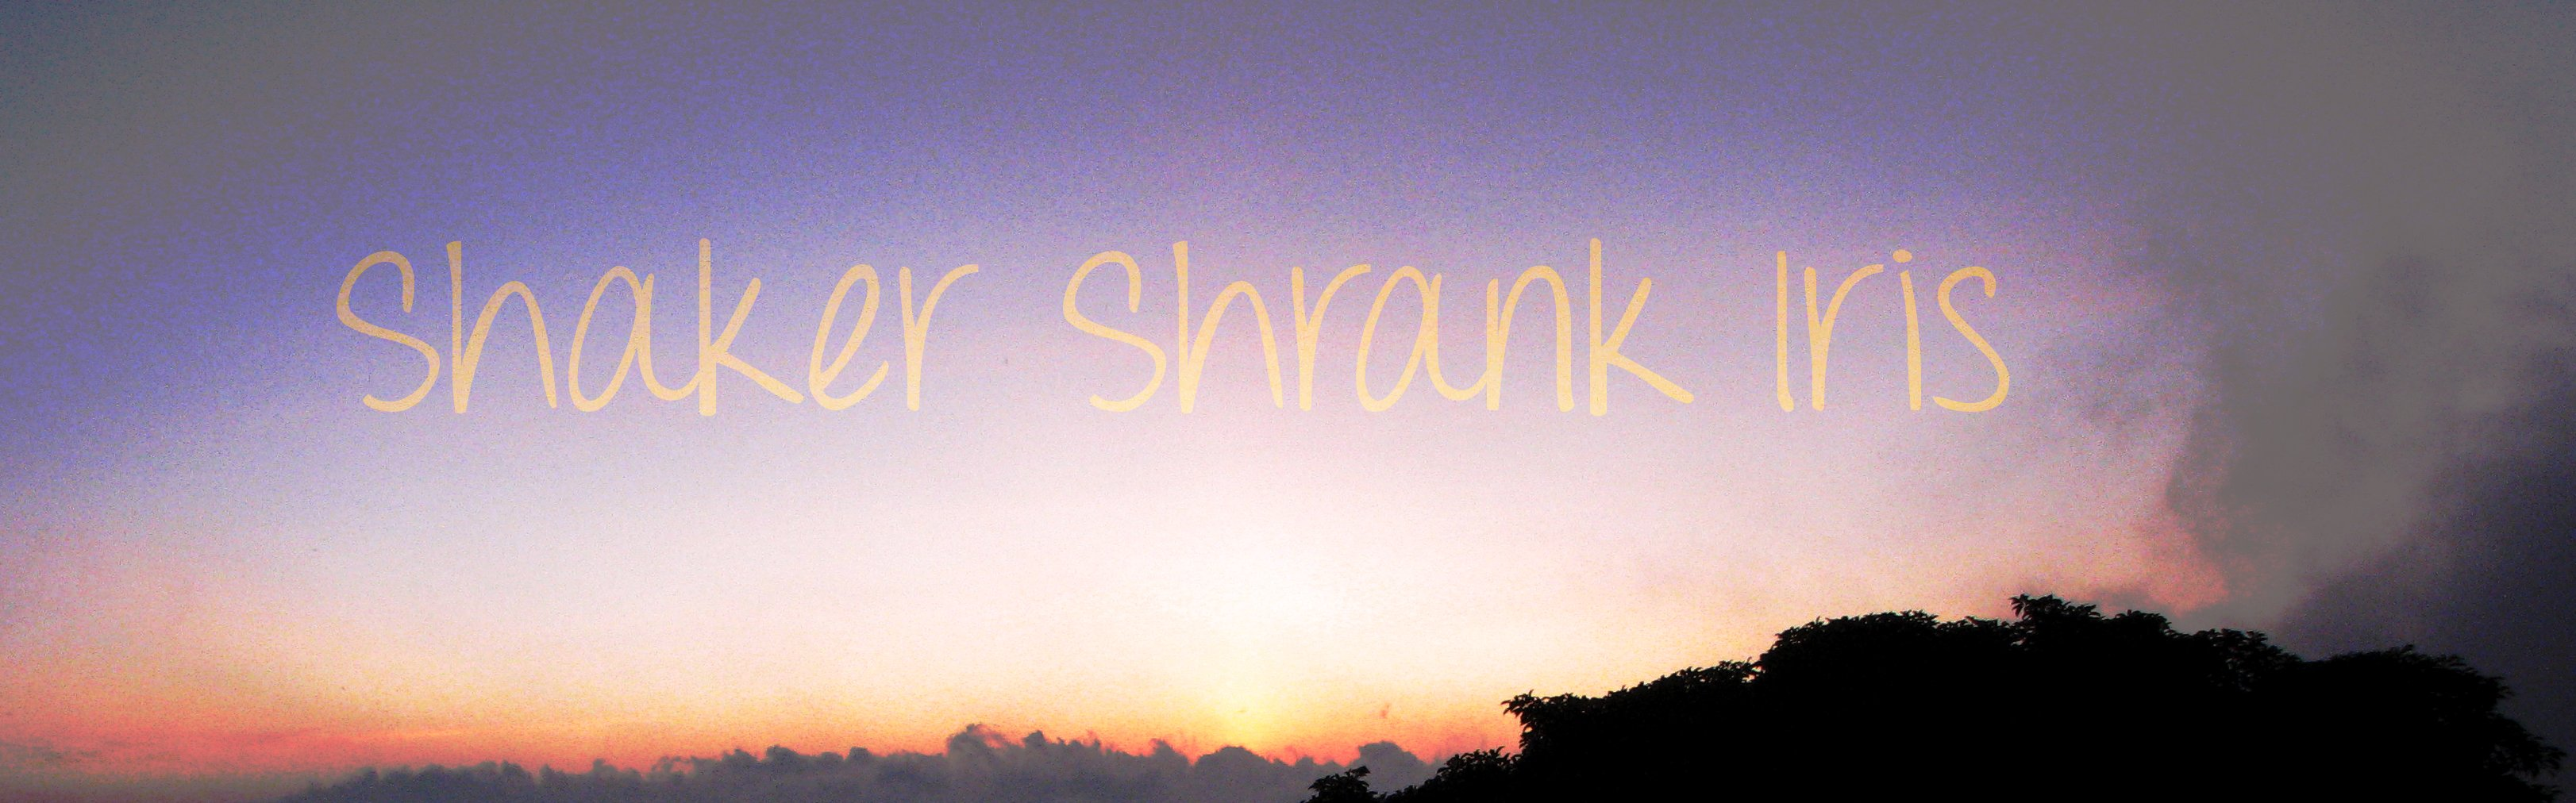 Shaker Shrank Iris